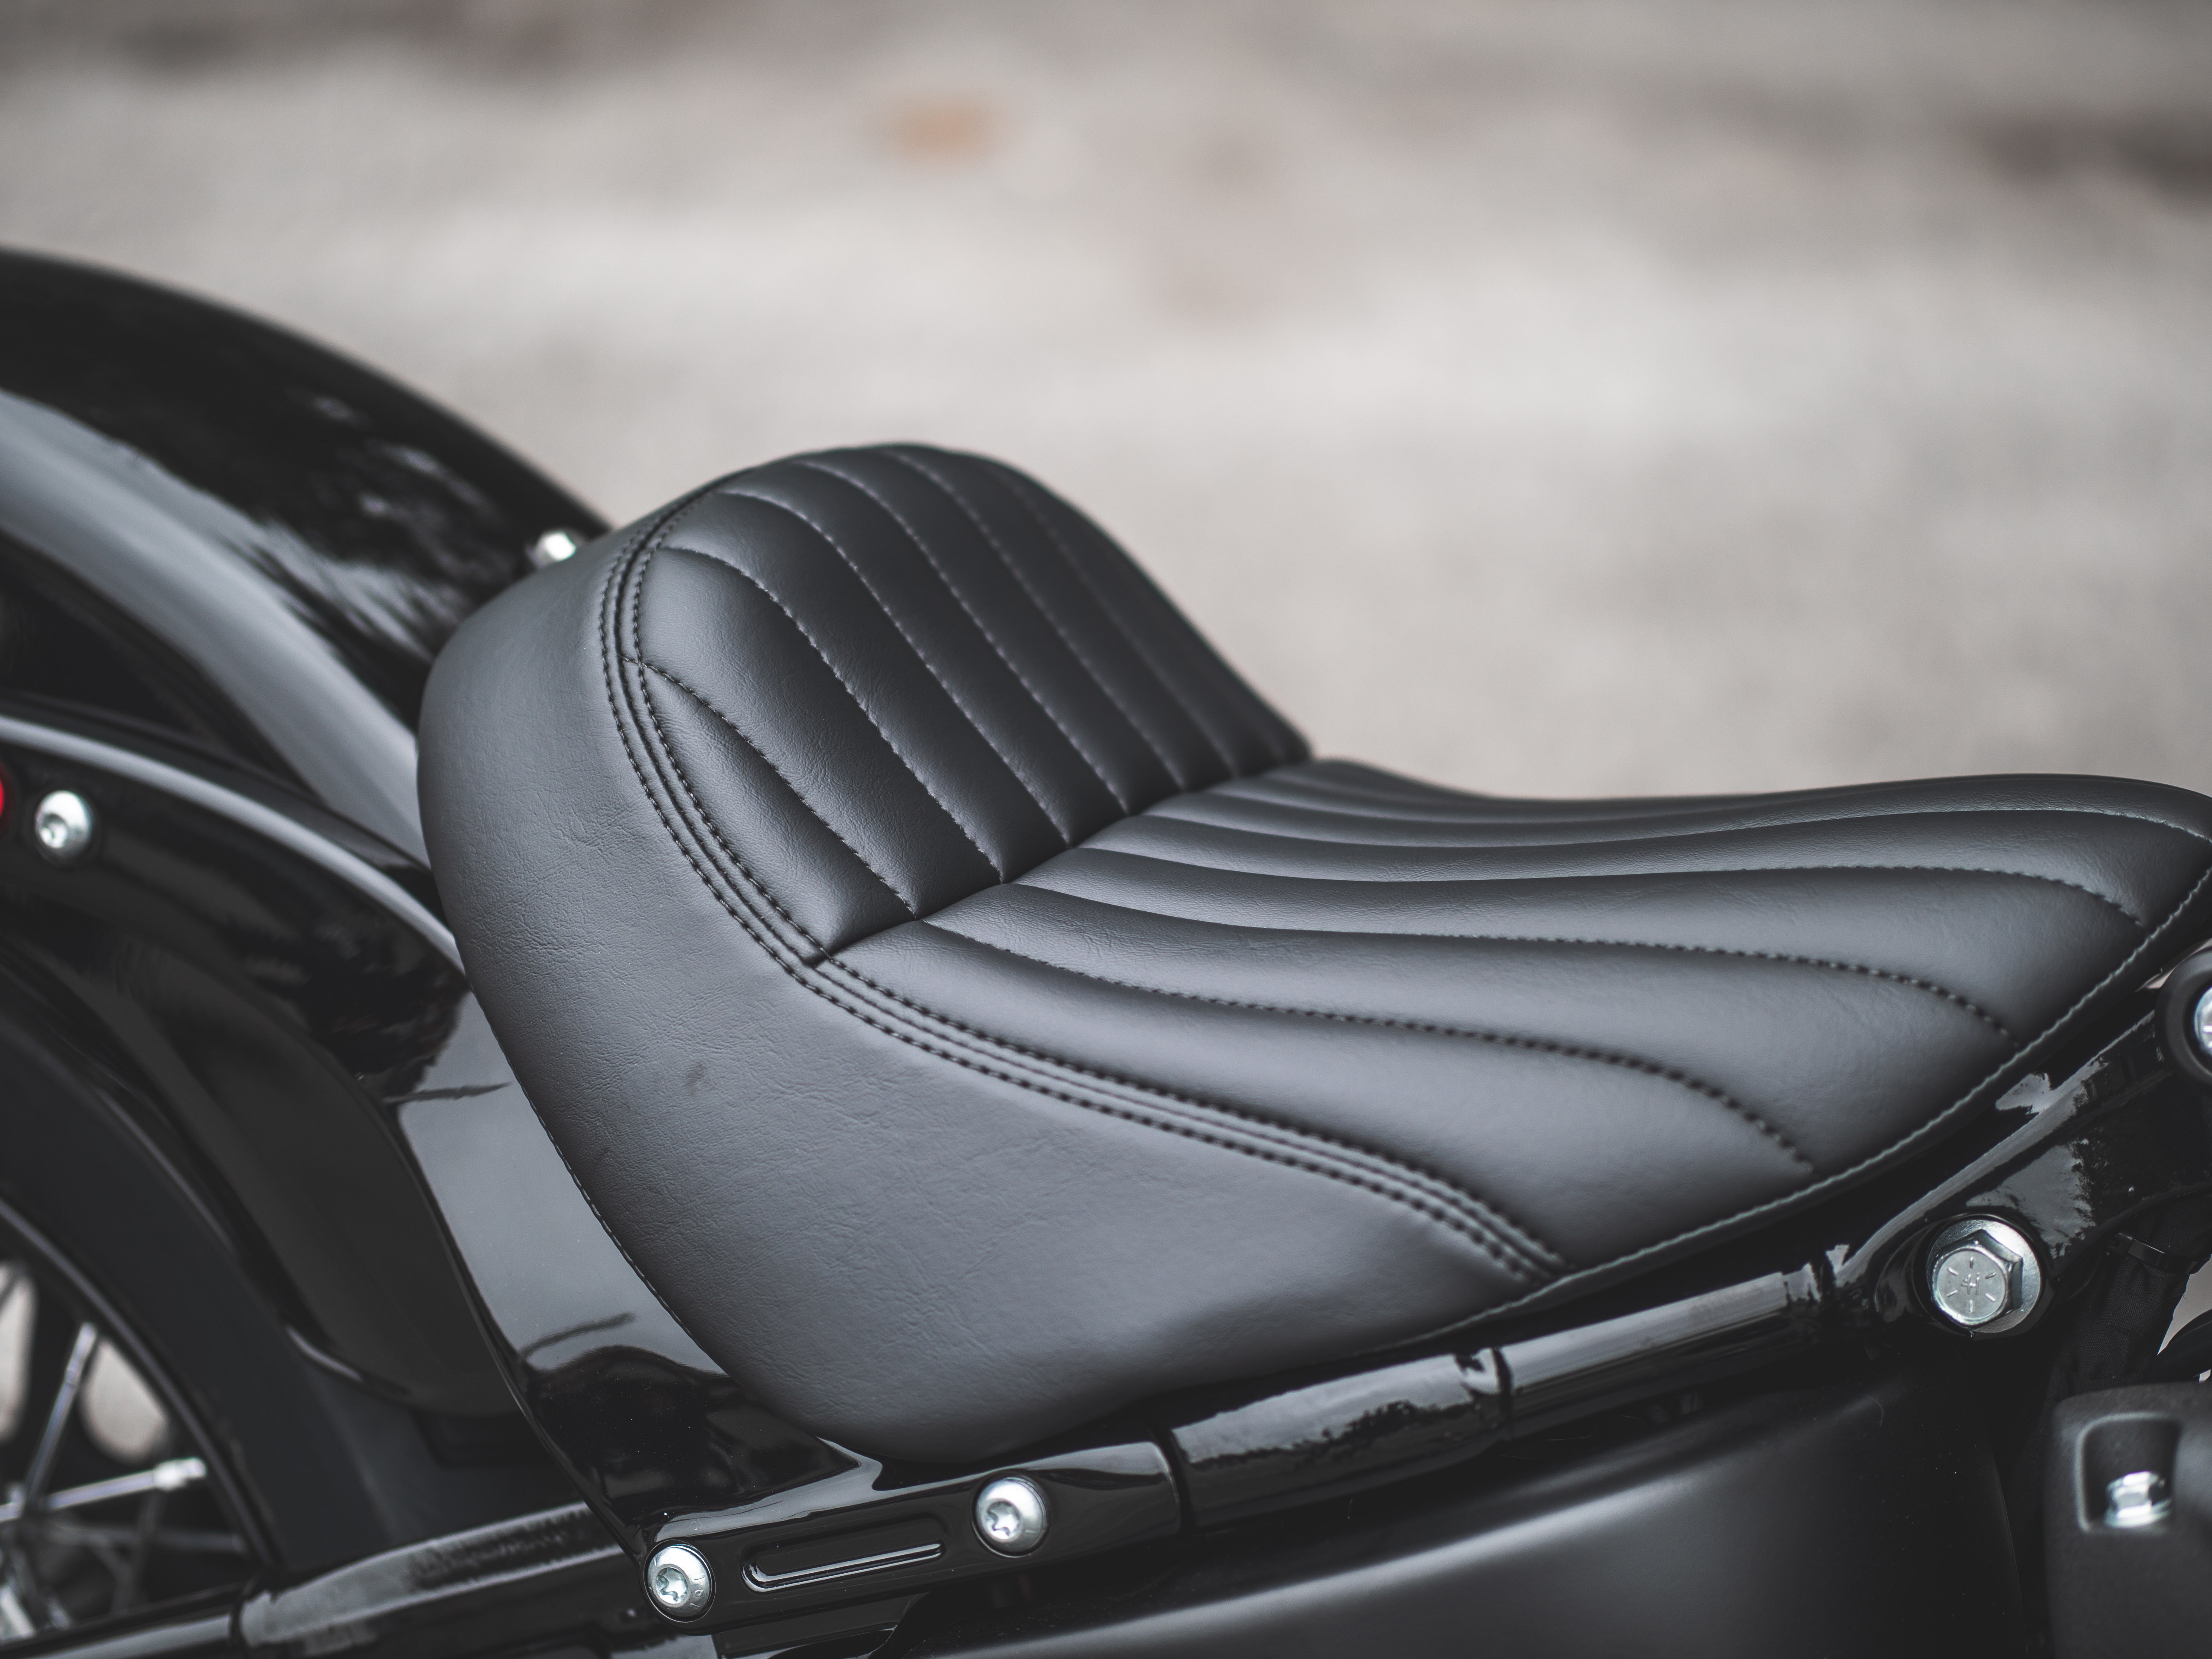 New 2019 Harley-Davidson Street Bob